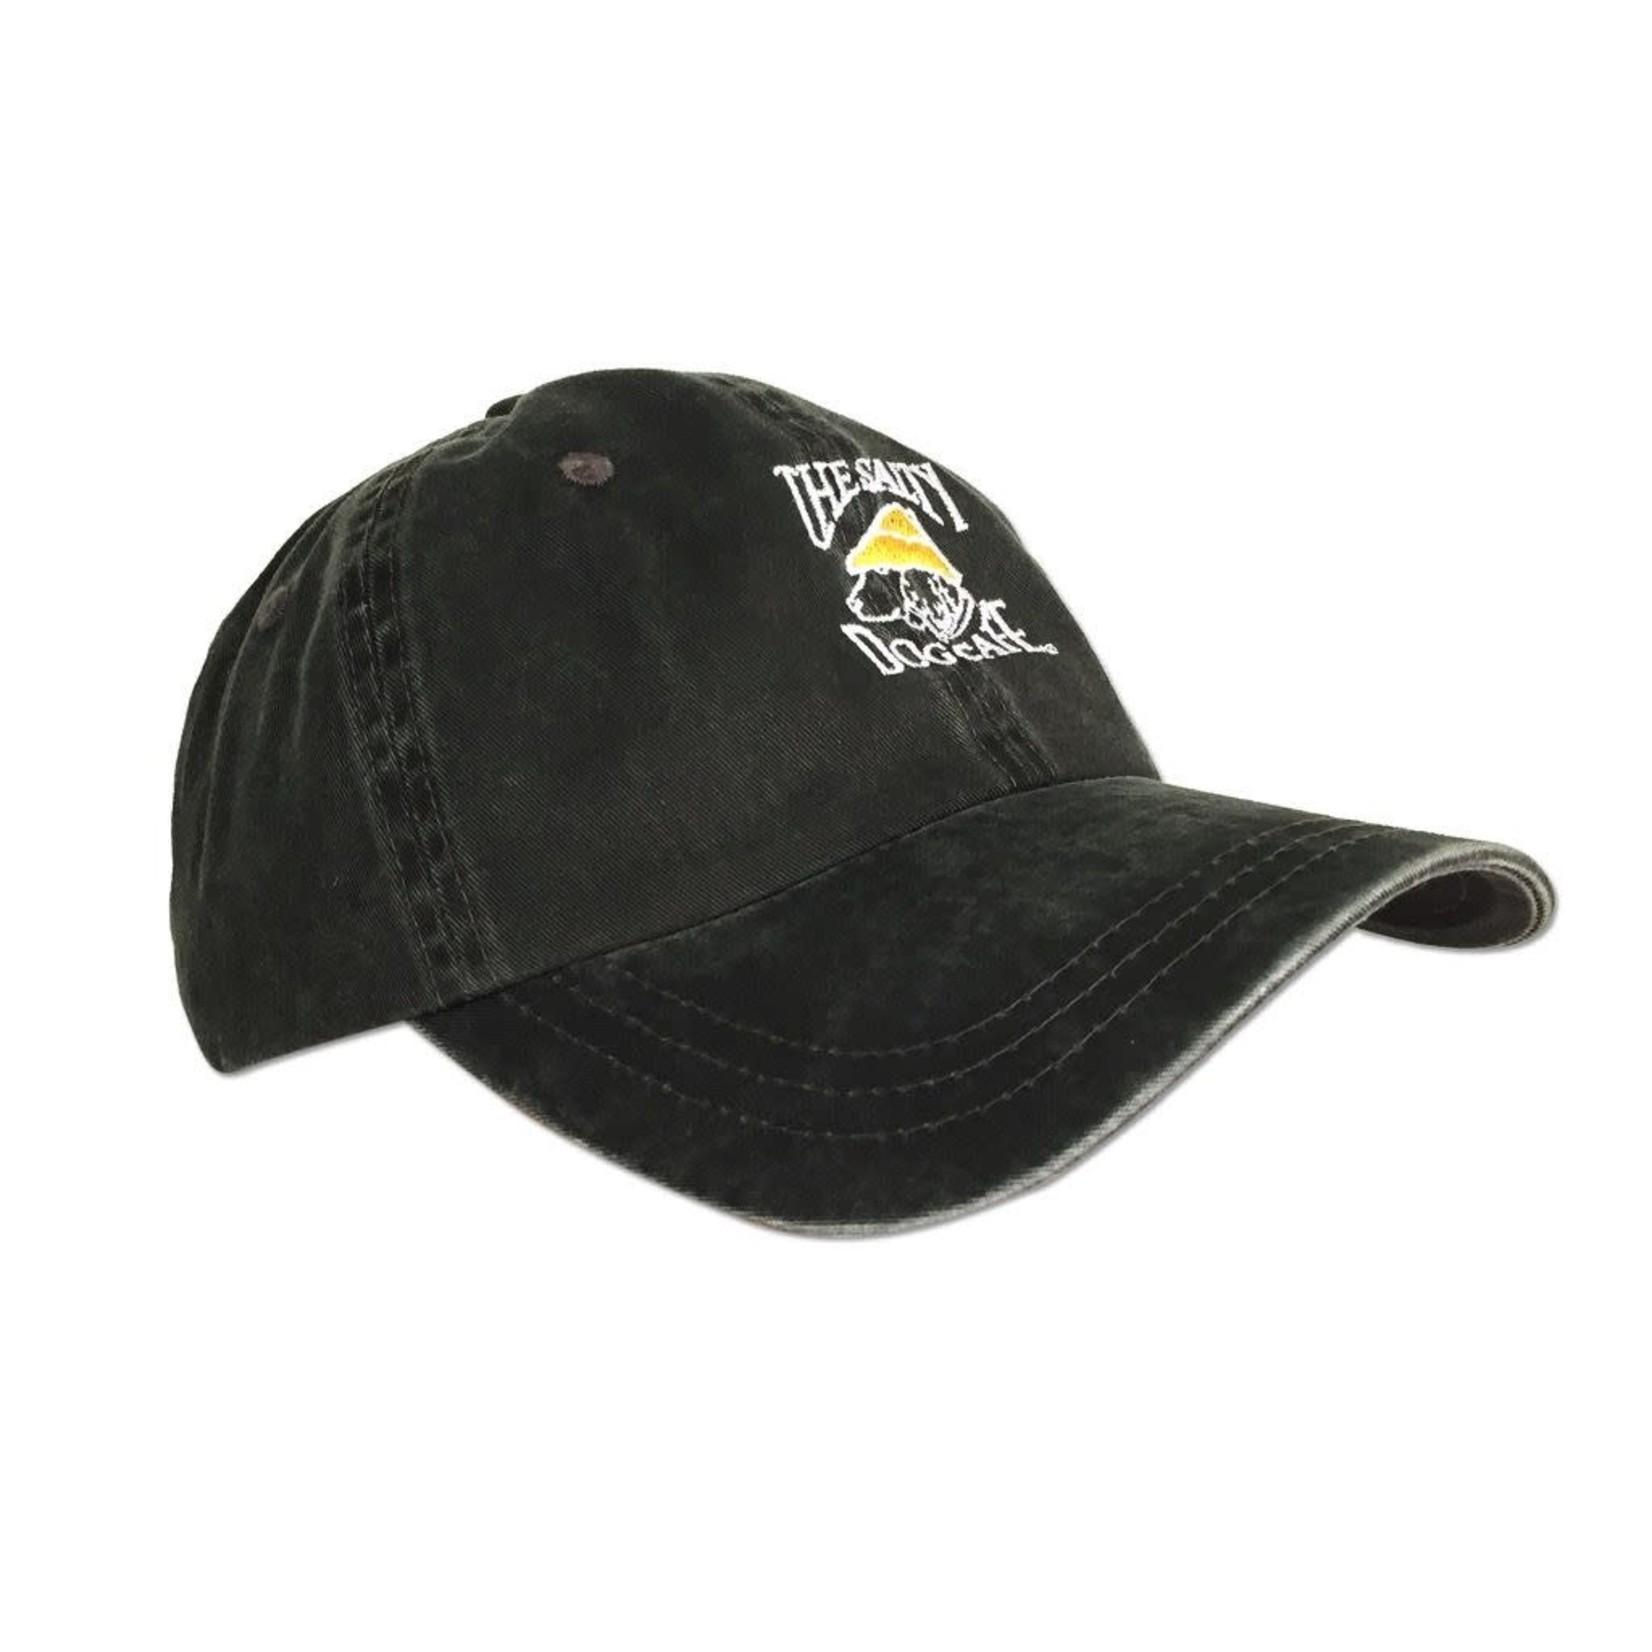 Hat - Pigment Dyed, Black, Adult